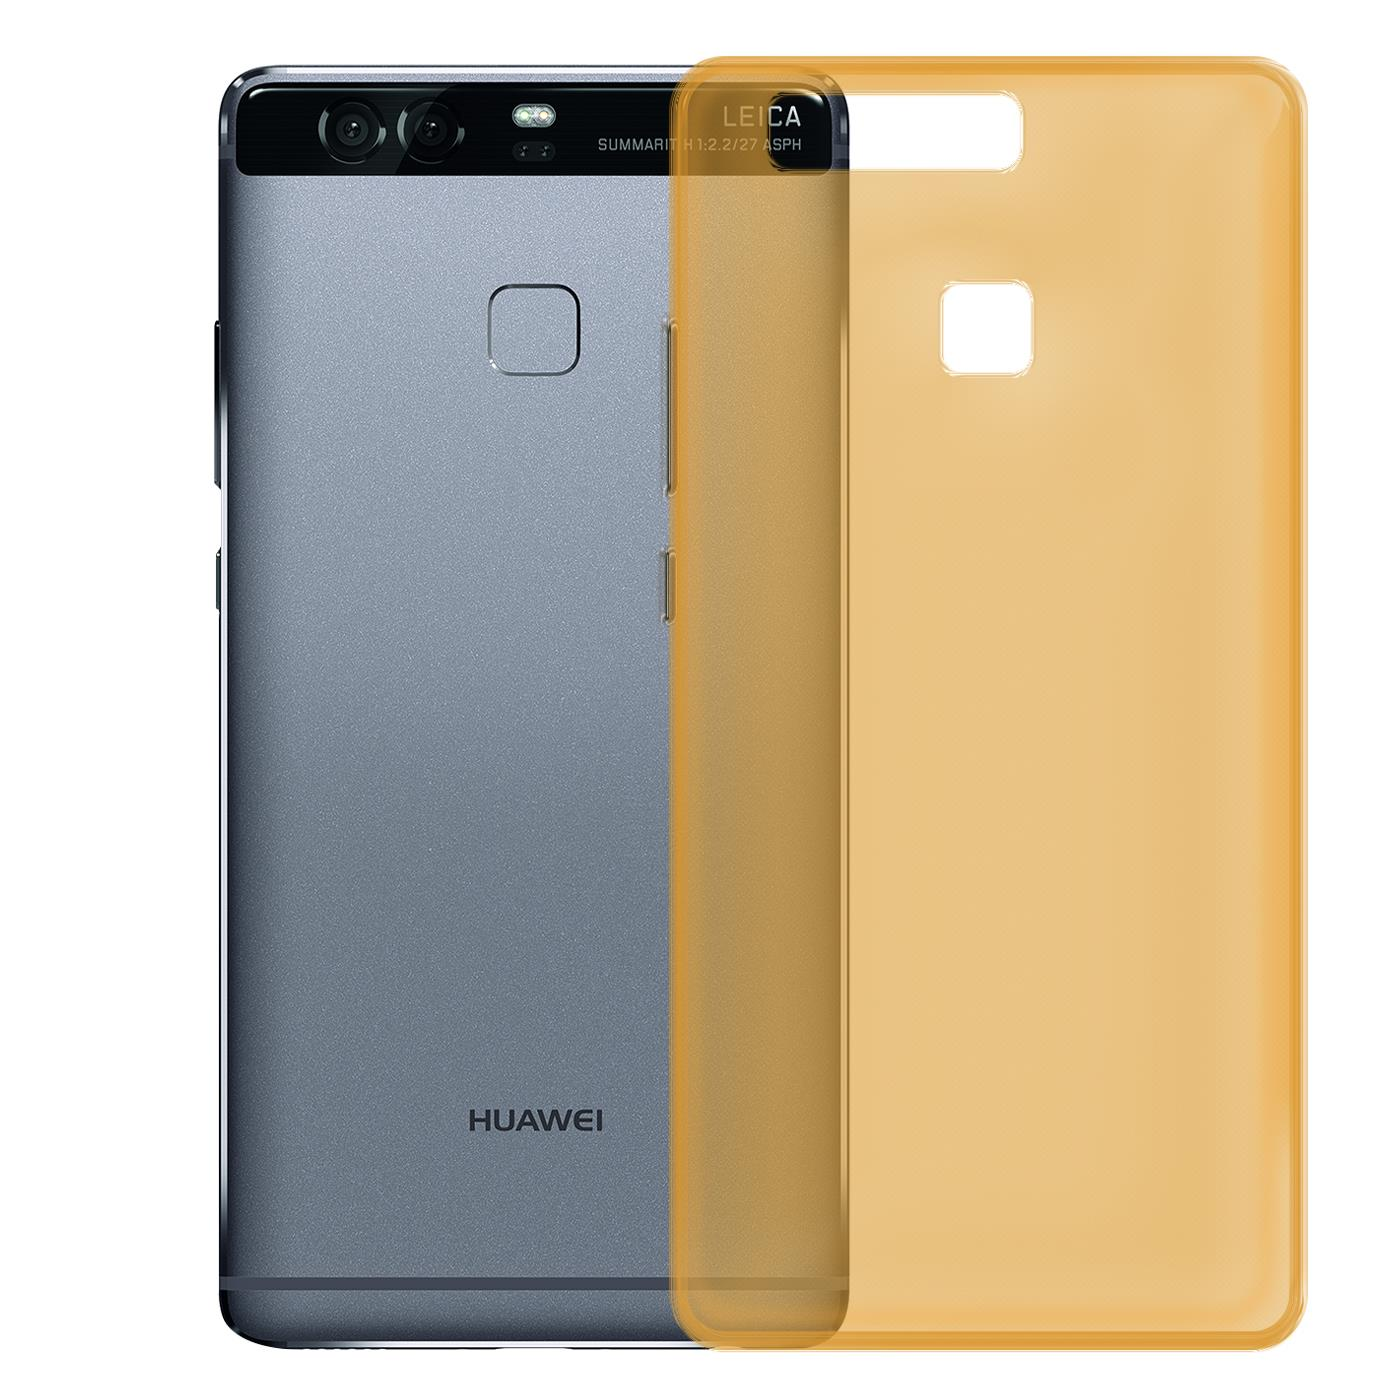 Huawei-p9-Duenn-Silikon-Klar-Case-Cover-Ultra-Slim-Stossfeste-Gel-Rueckseite Indexbild 16